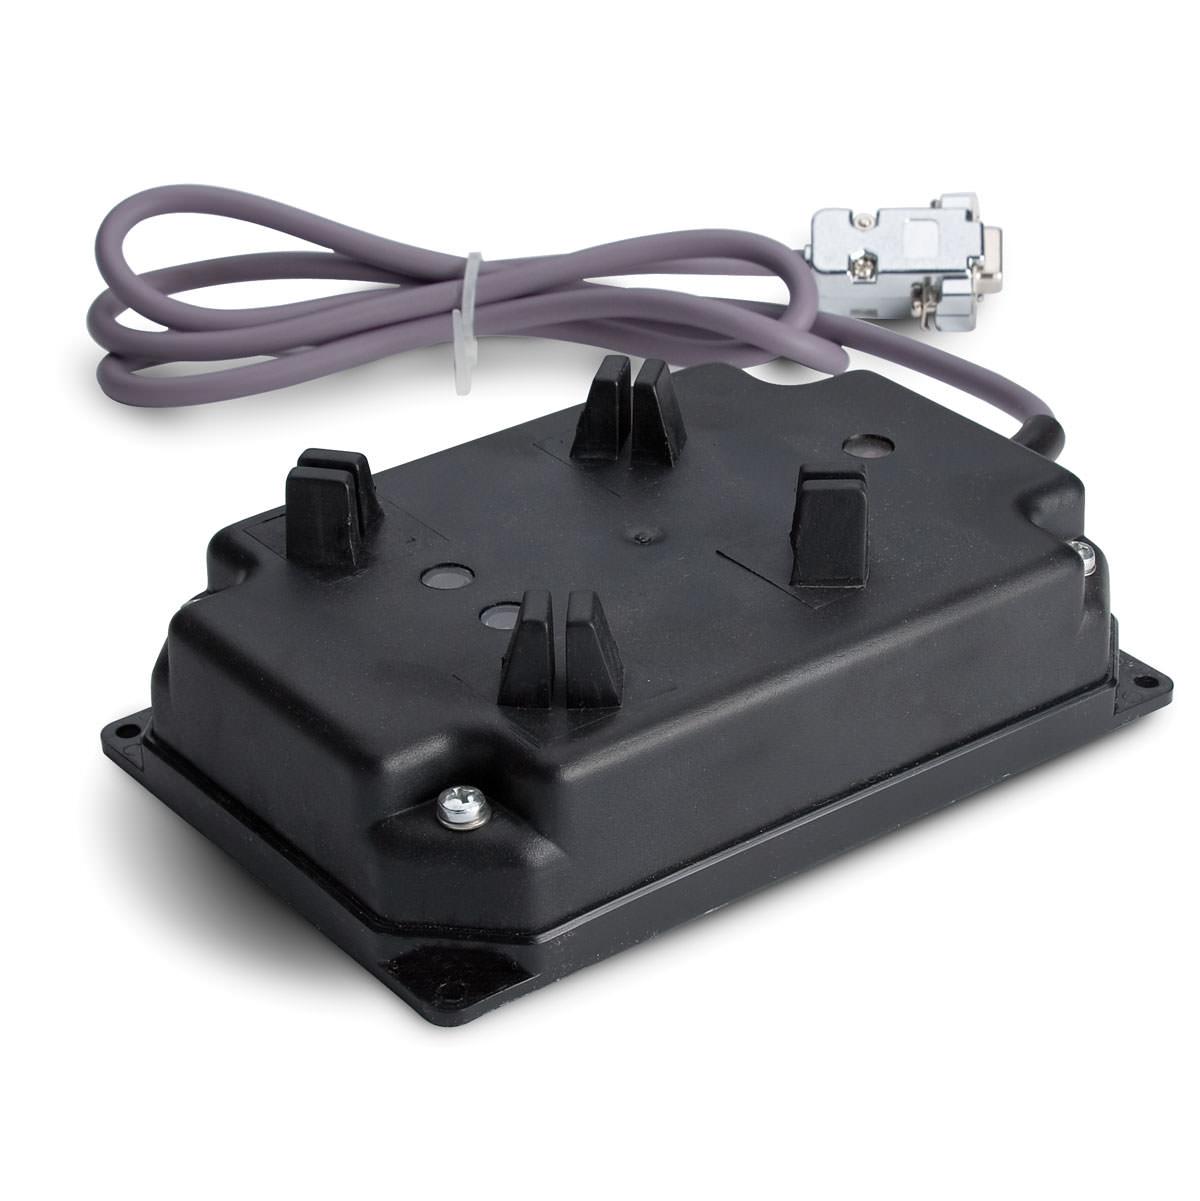 Transmisor Infrarrojo para Registradores de Temperatura - HI141001